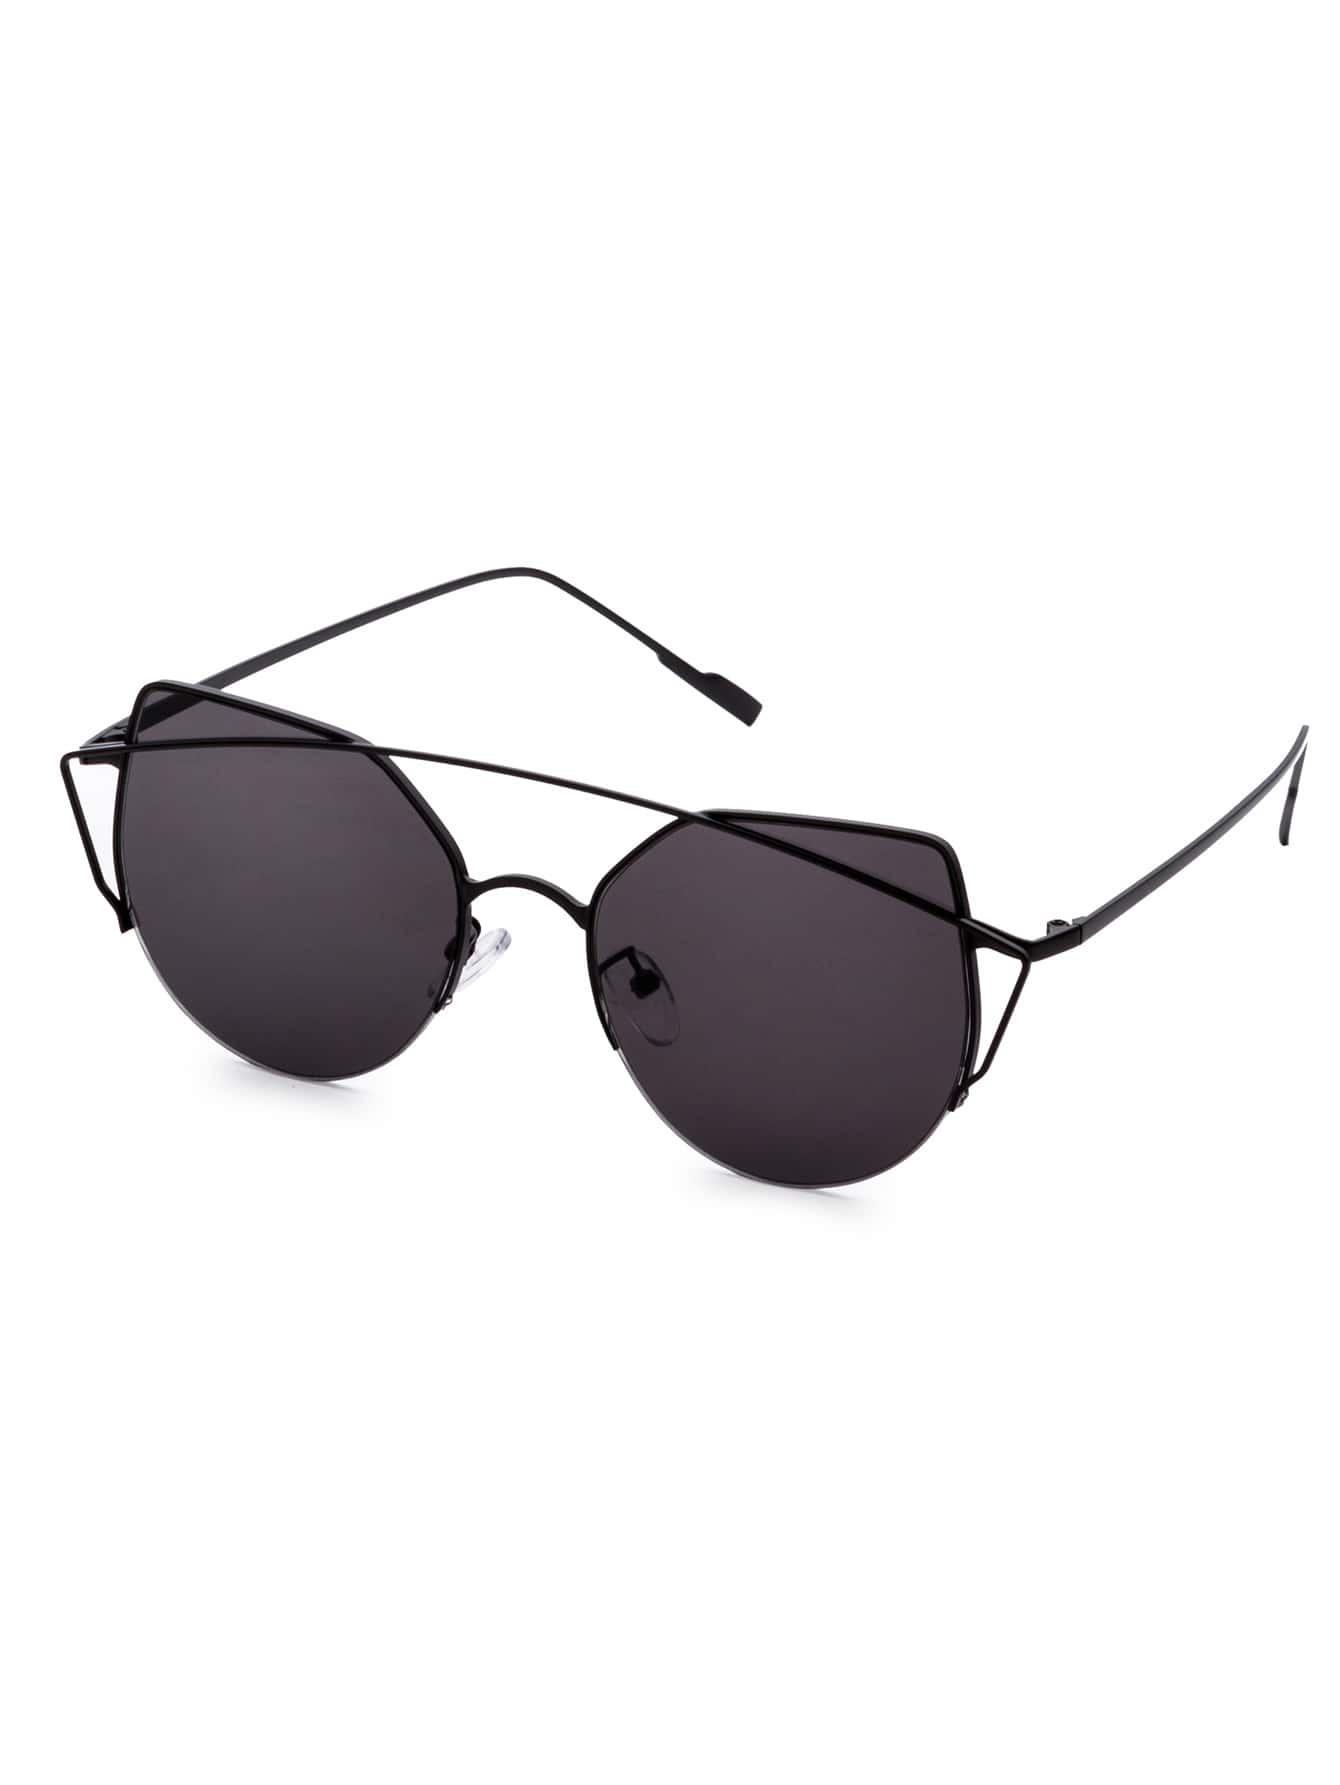 581d030735 Black Frame Double Bridge Cat Eye Sunglasses EmmaCloth-Women Fast ...